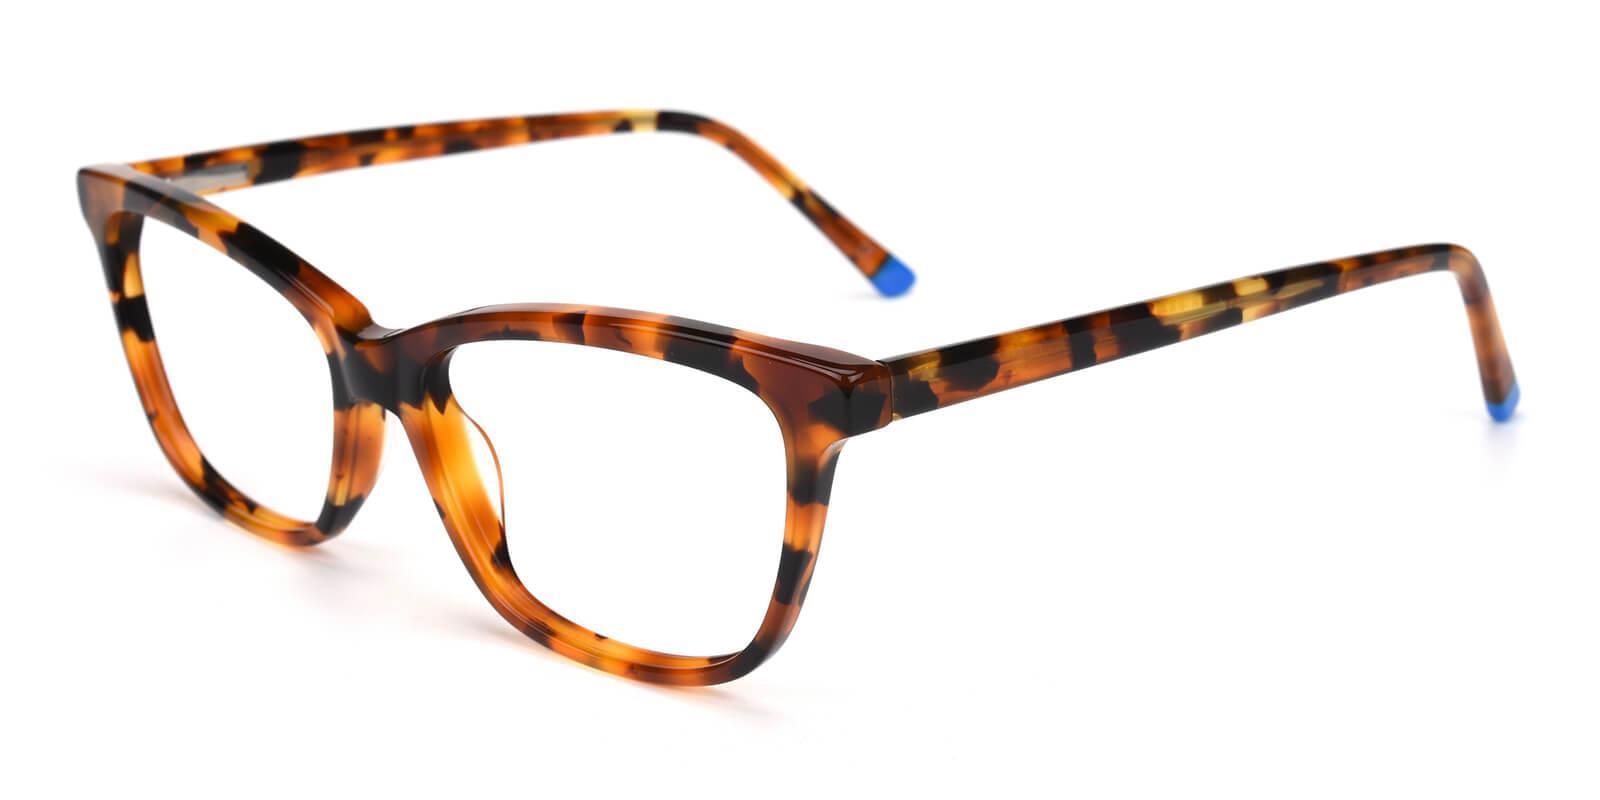 Ezra-Leopard-Cat-Acetate-Eyeglasses-additional1